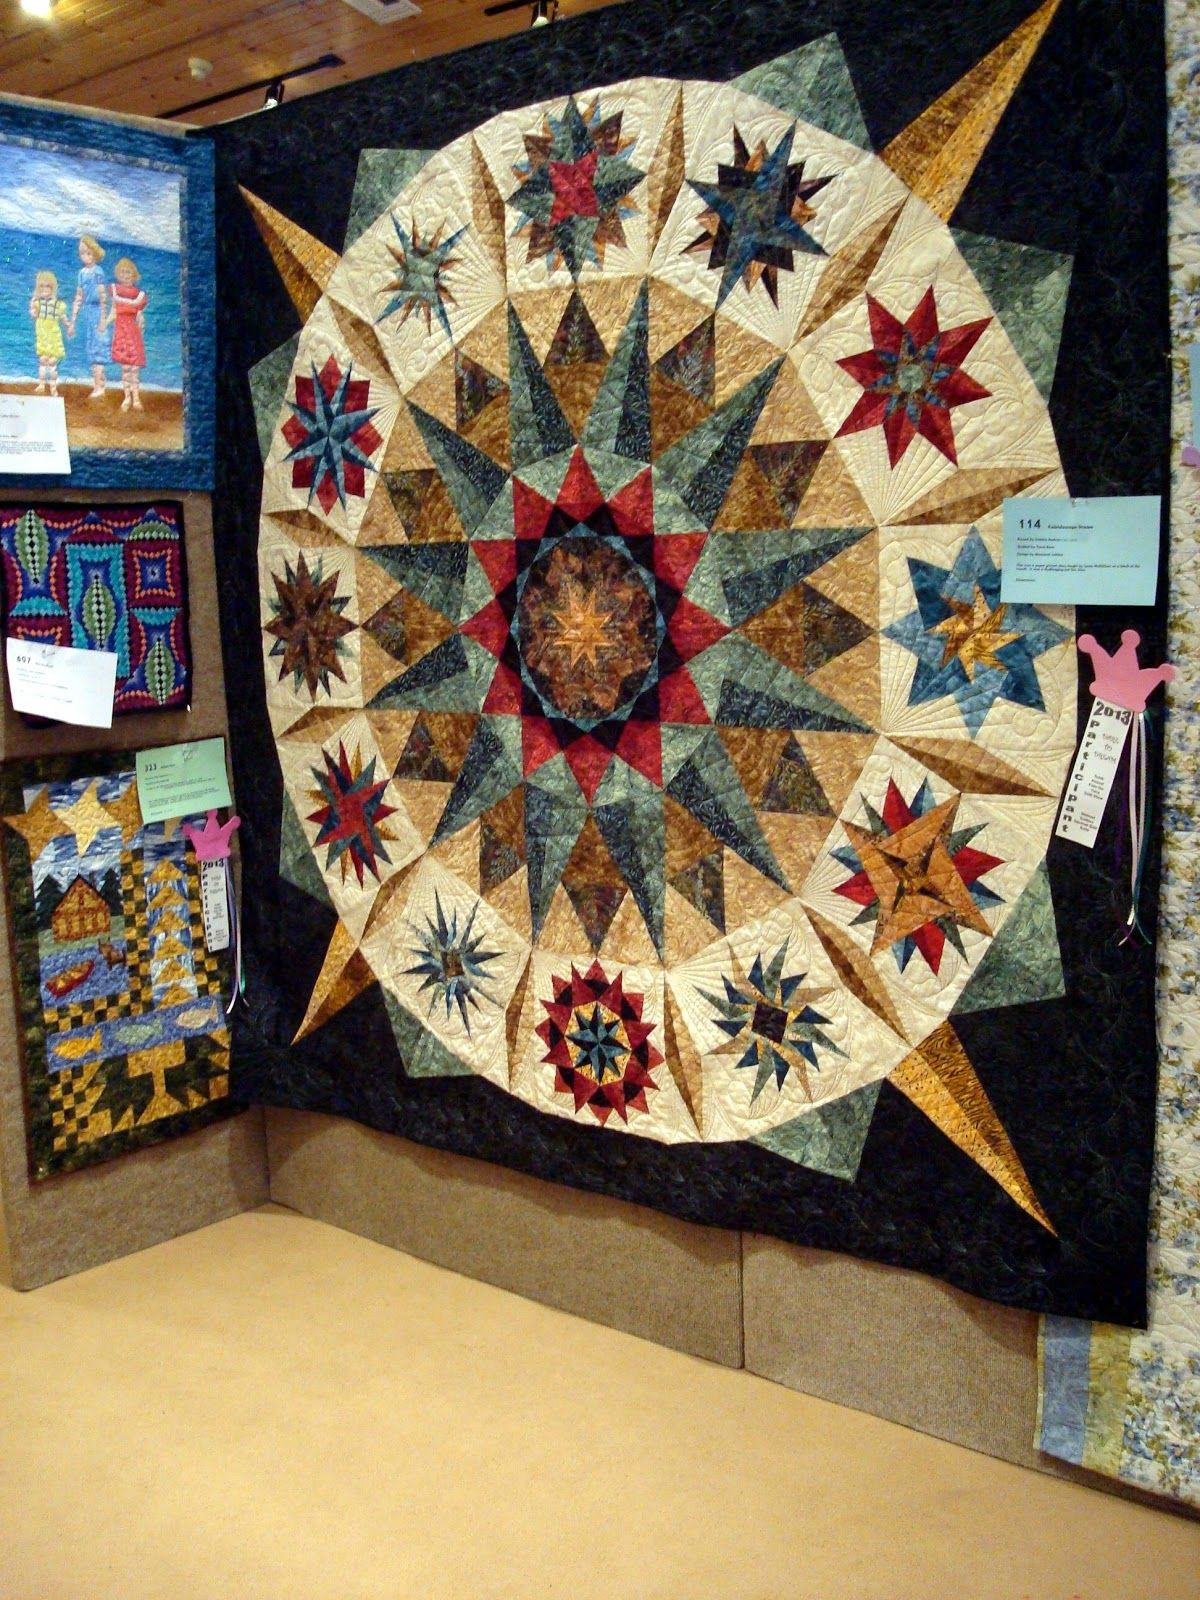 Edyta Sitar New Quilt Patterns This Quilt Is A Stunner